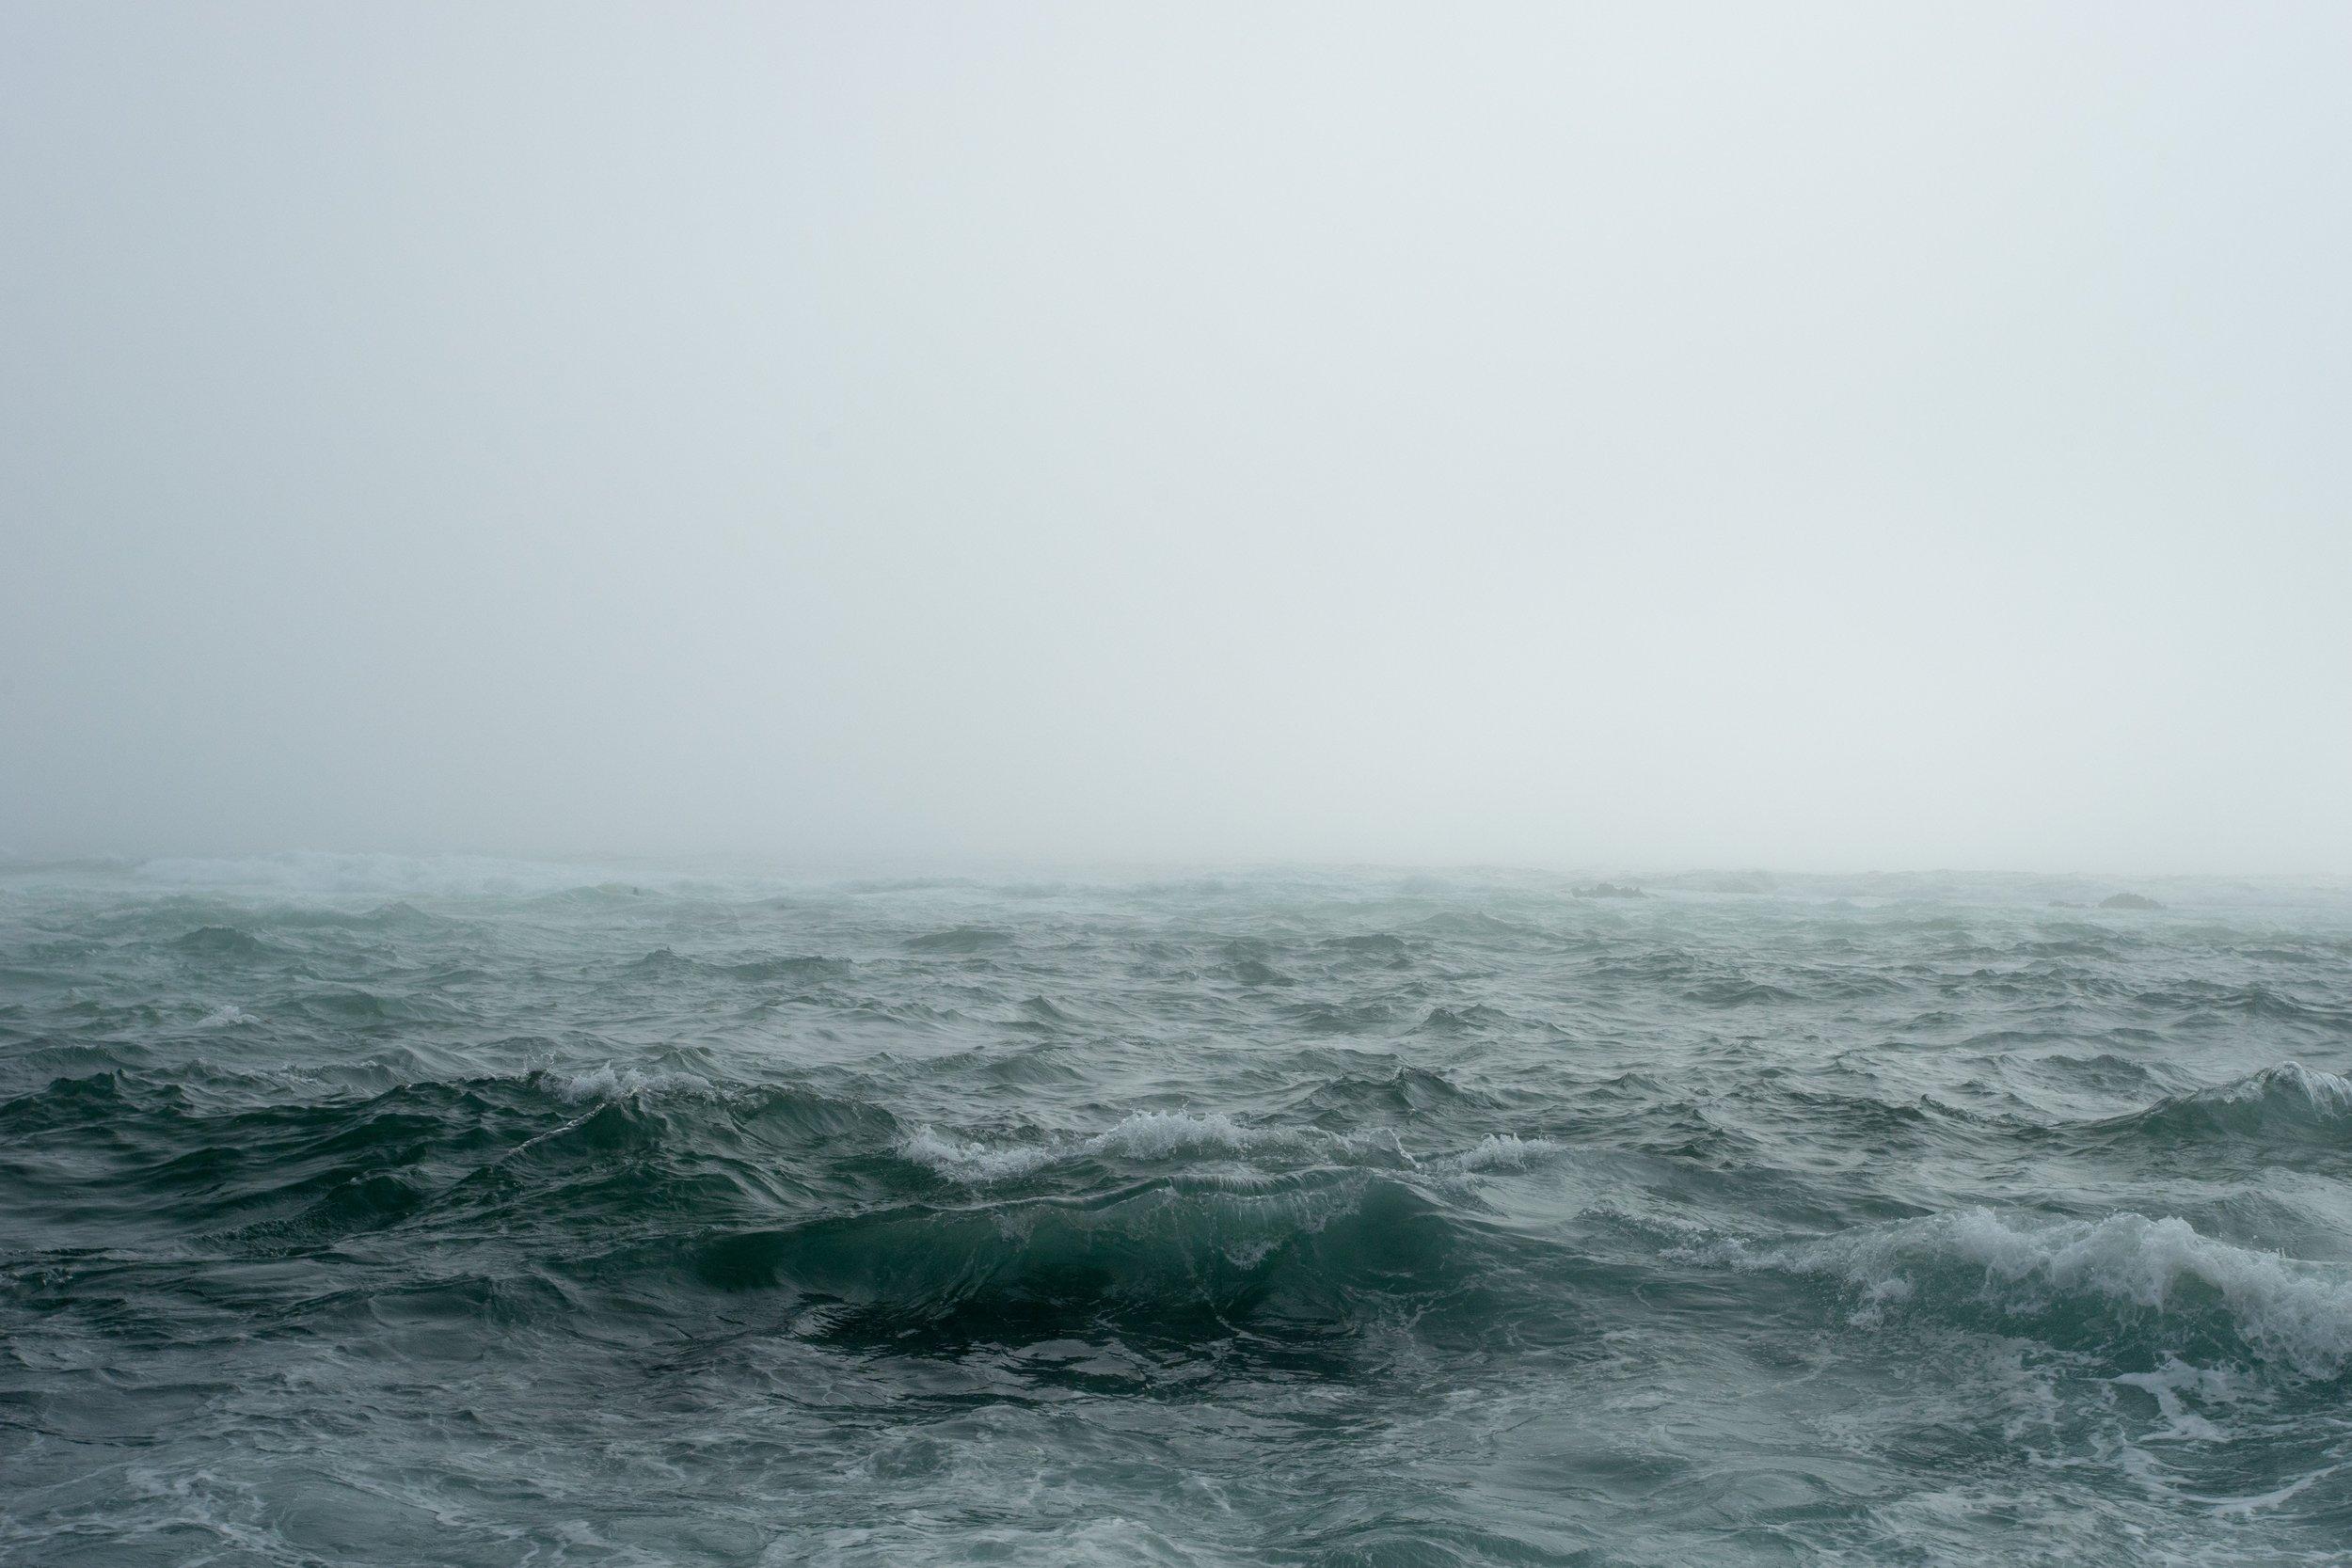 Hurricane Florence -